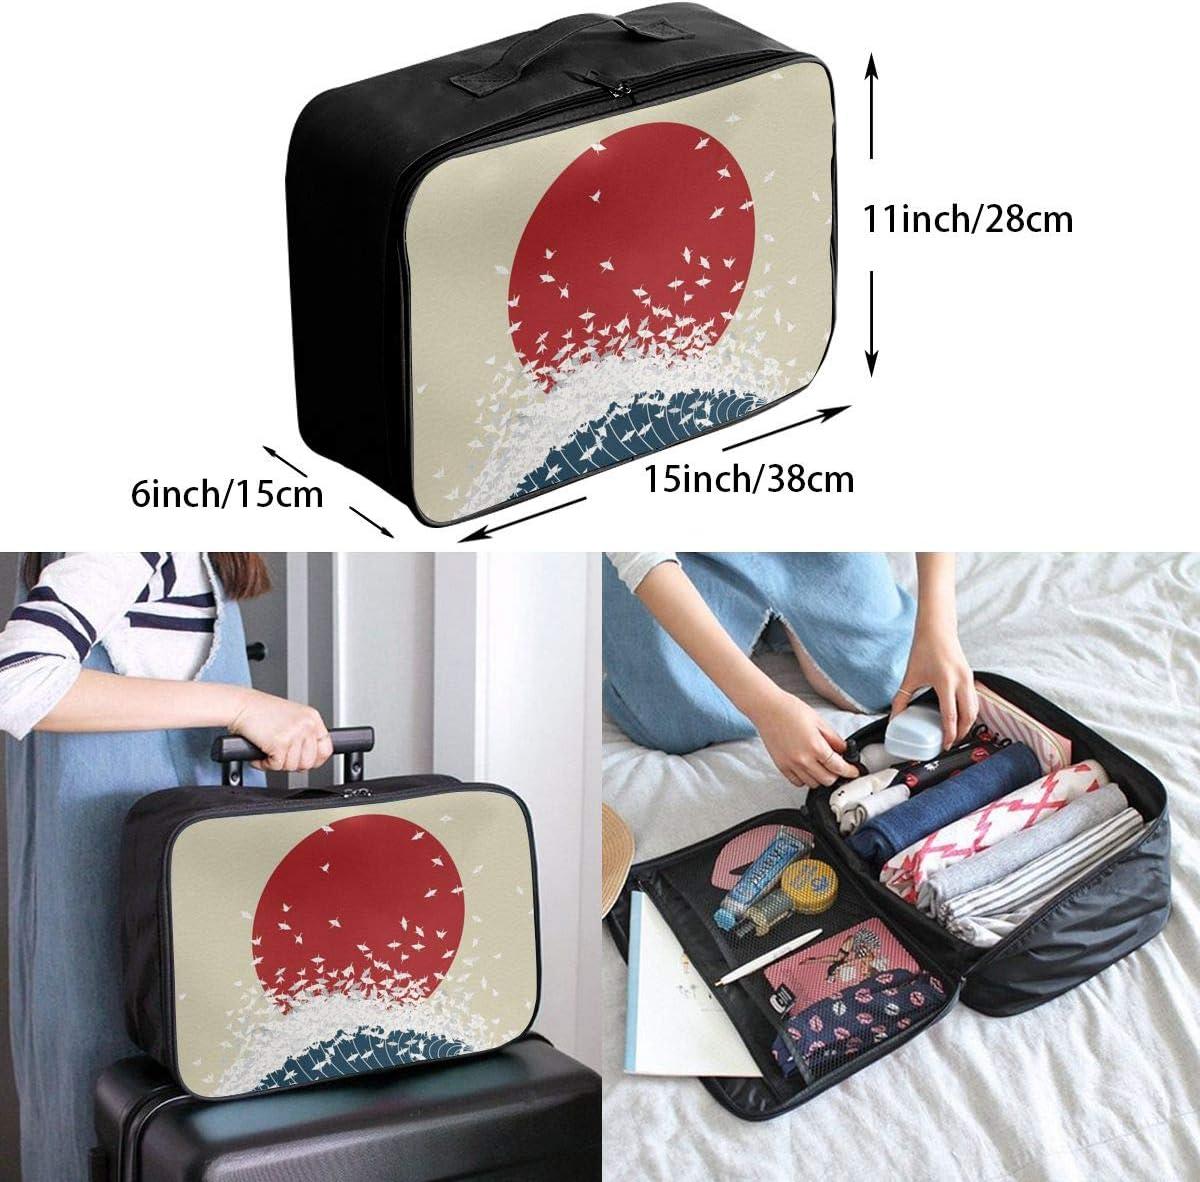 Japanese-art Travel Carry-on Luggage Weekender Bag Overnight Tote Flight Duffel In Trolley Handle